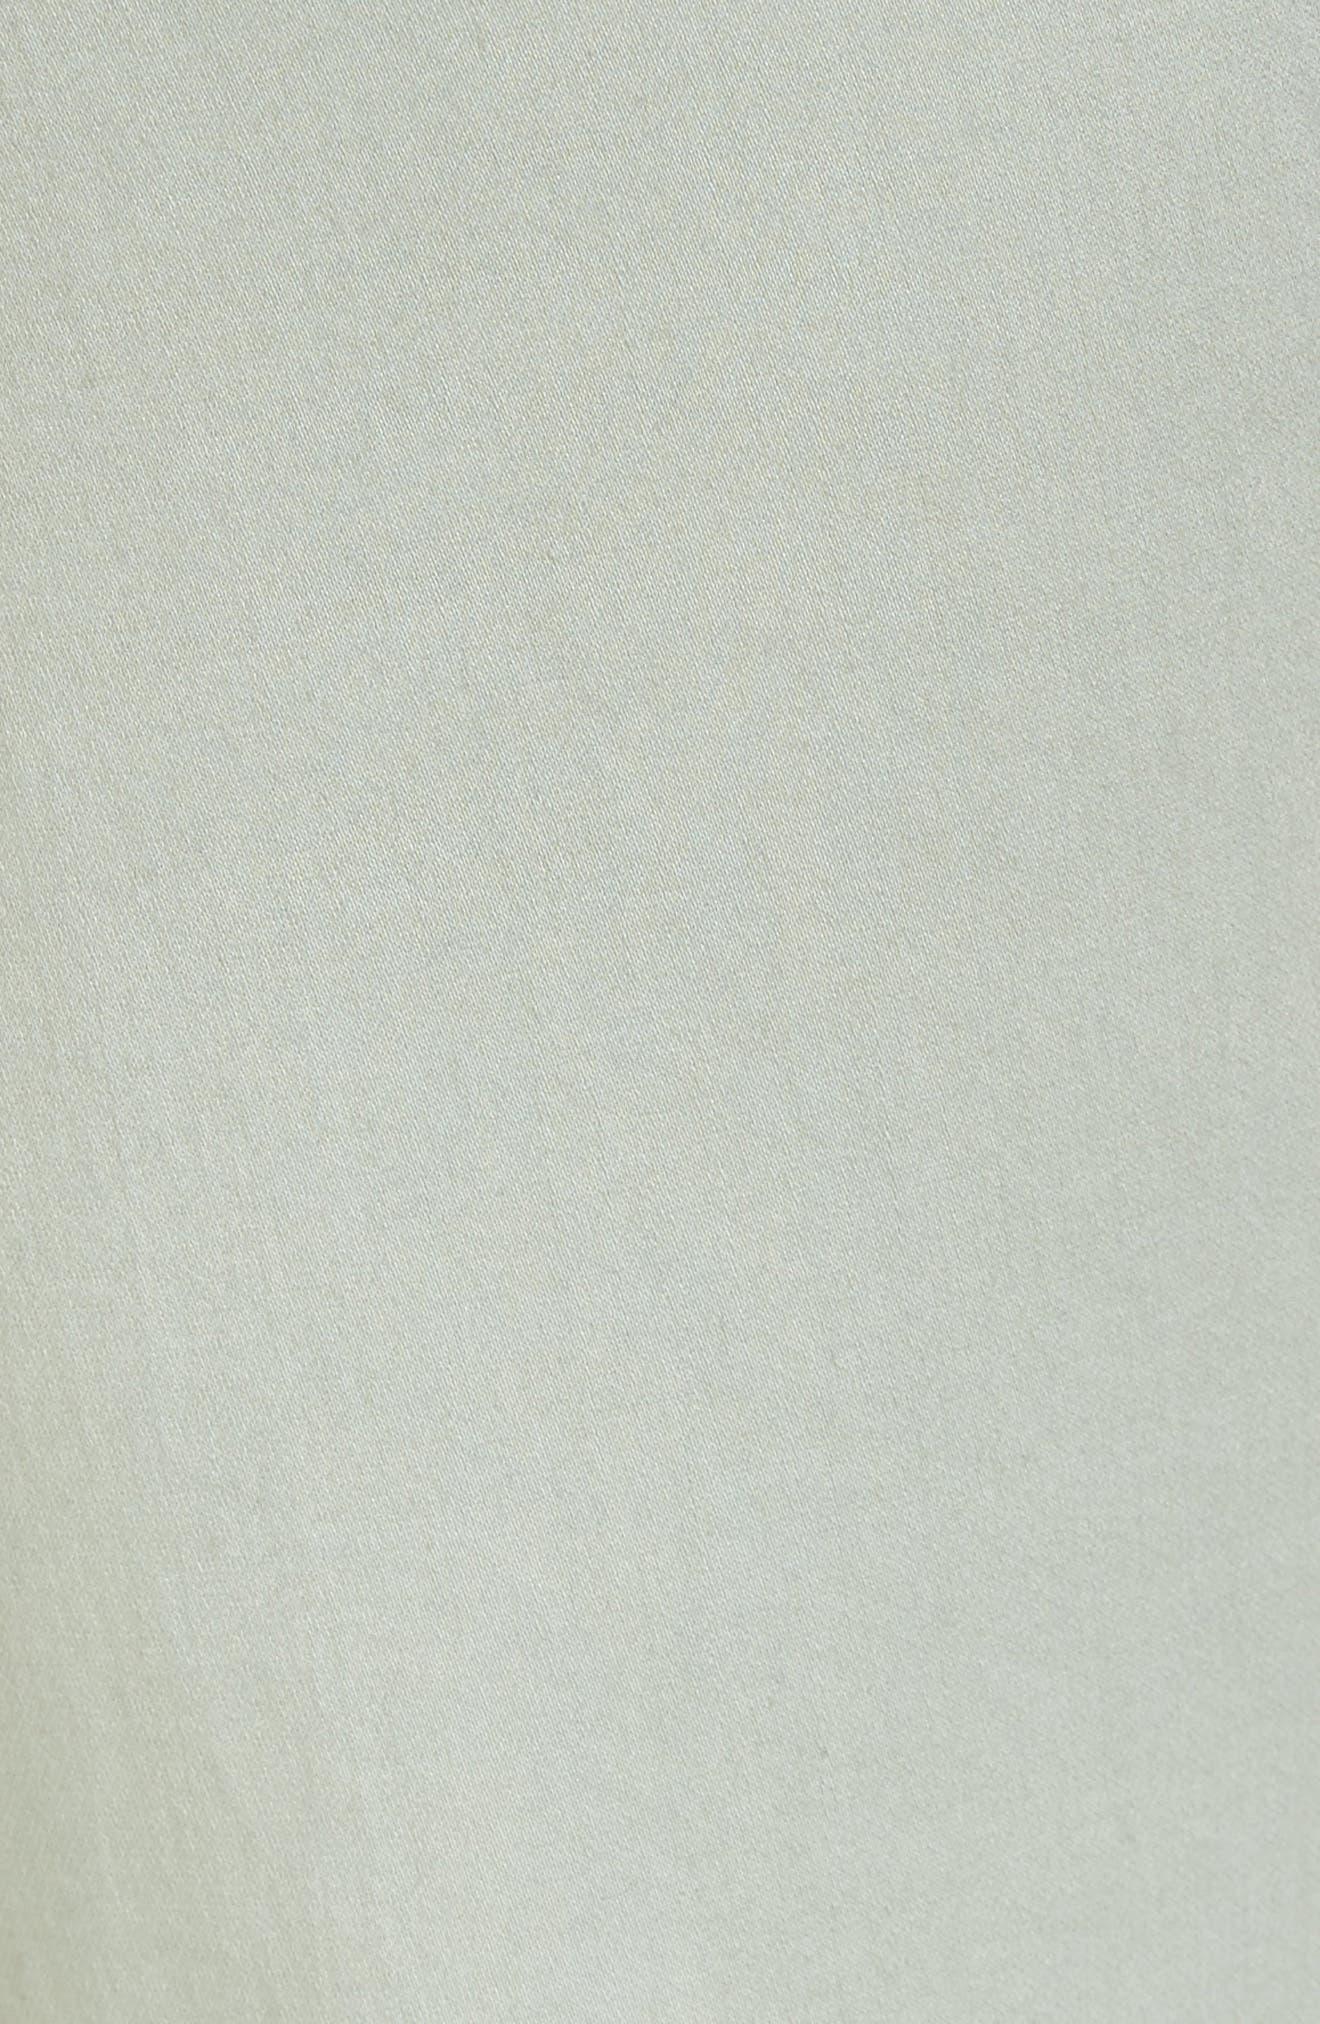 Carter Knit Denim Girlfriend Jeans,                             Alternate thumbnail 5, color,                             Beach Glass